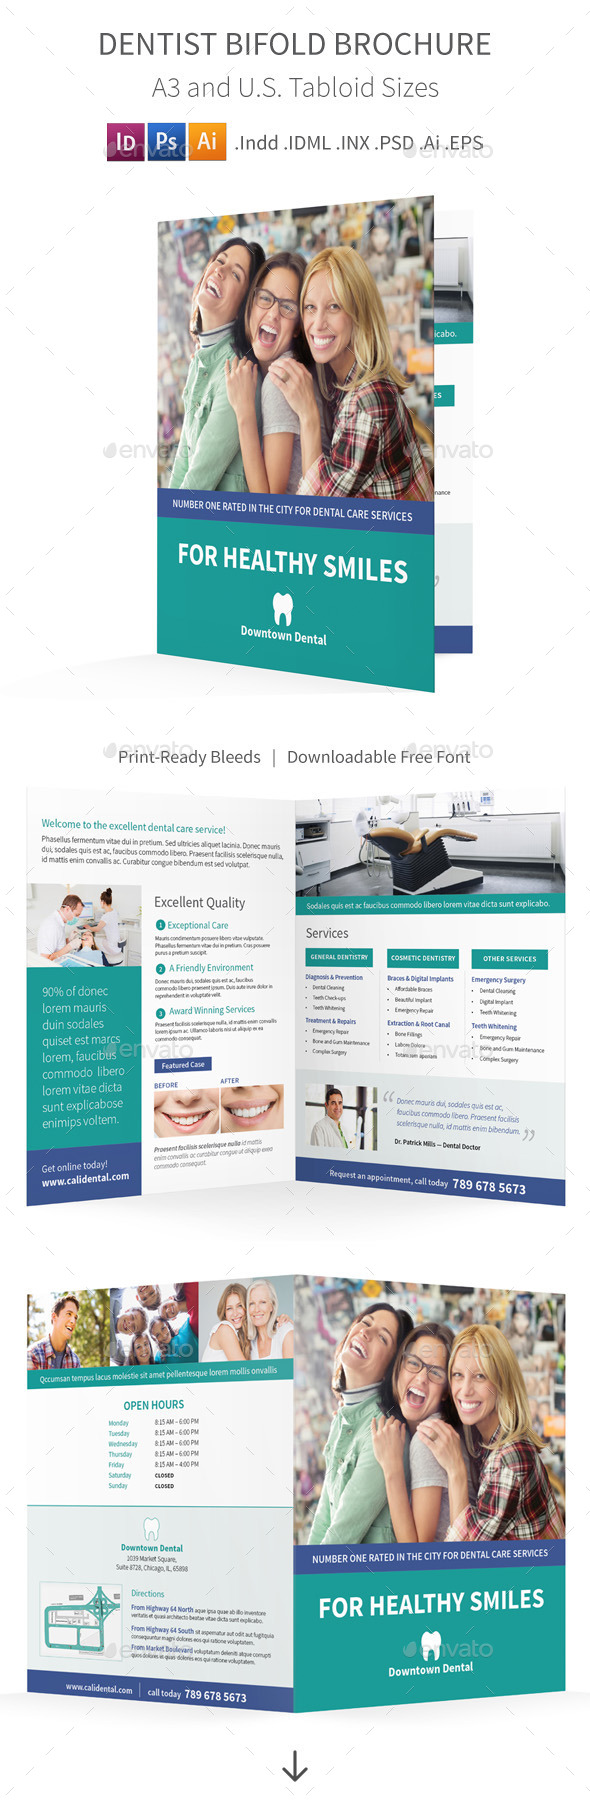 Dentist Bifold Halffold Brochure